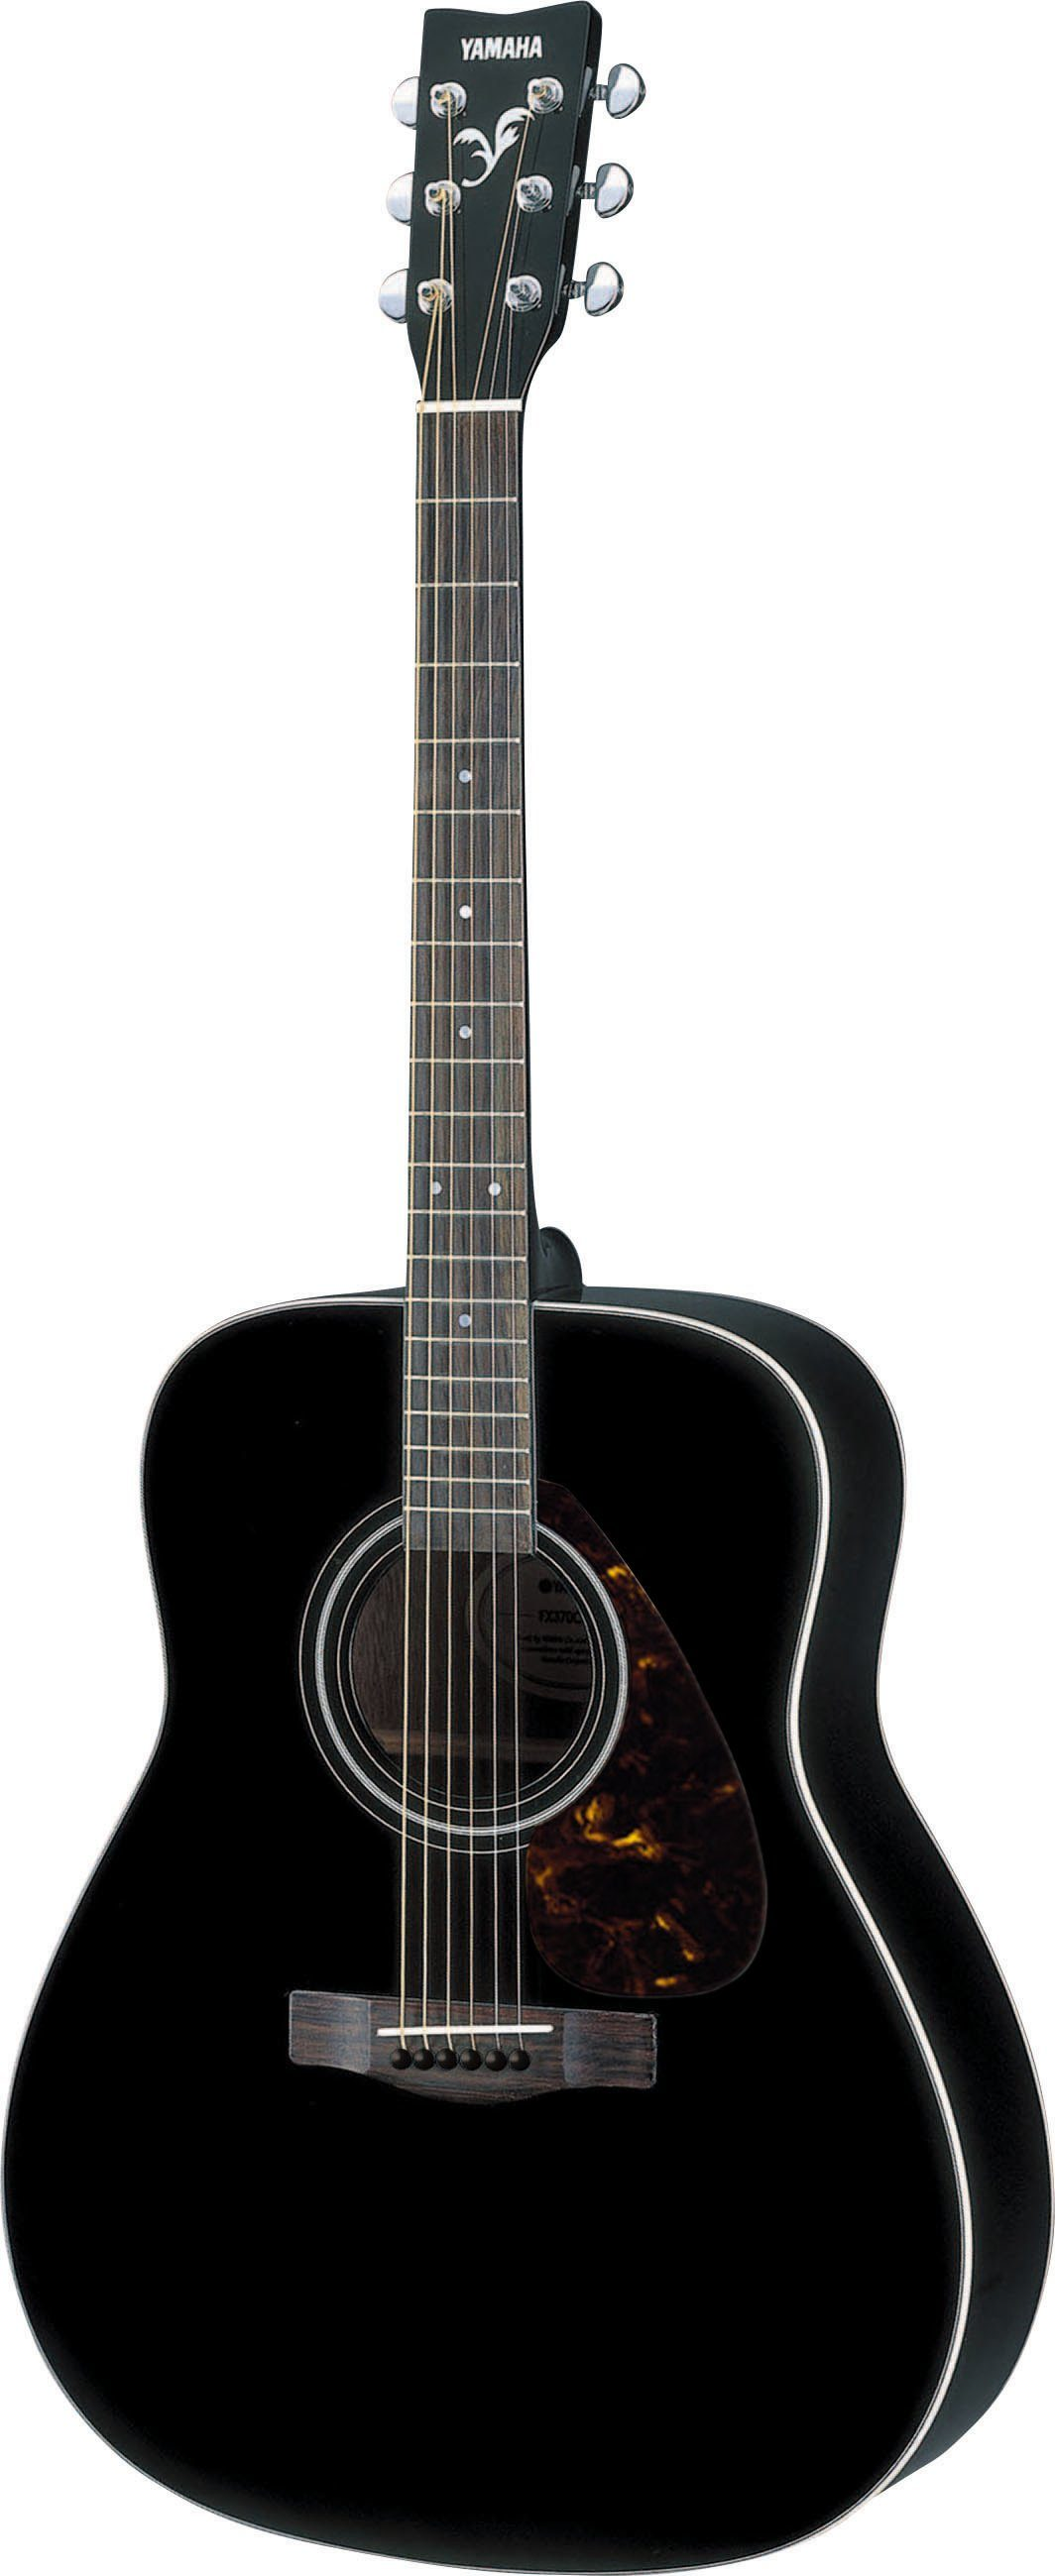 Yamaha Westerngitarre, »4/4 Dreadnought Gitarre F370BL«